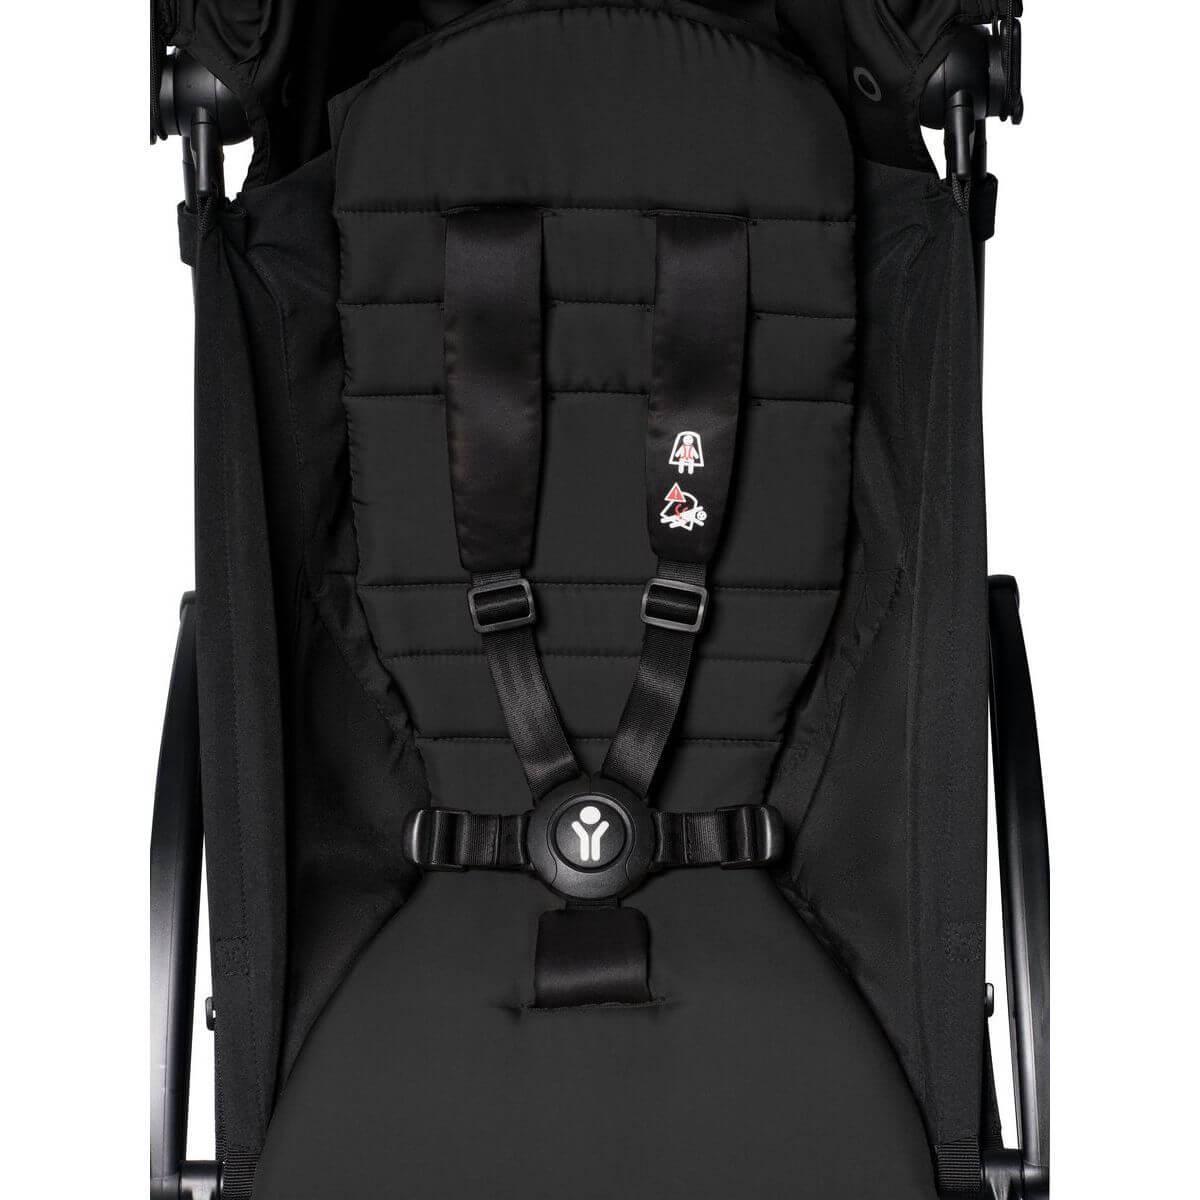 BABYZEN cochecito YOYO² 6+ negro-negro